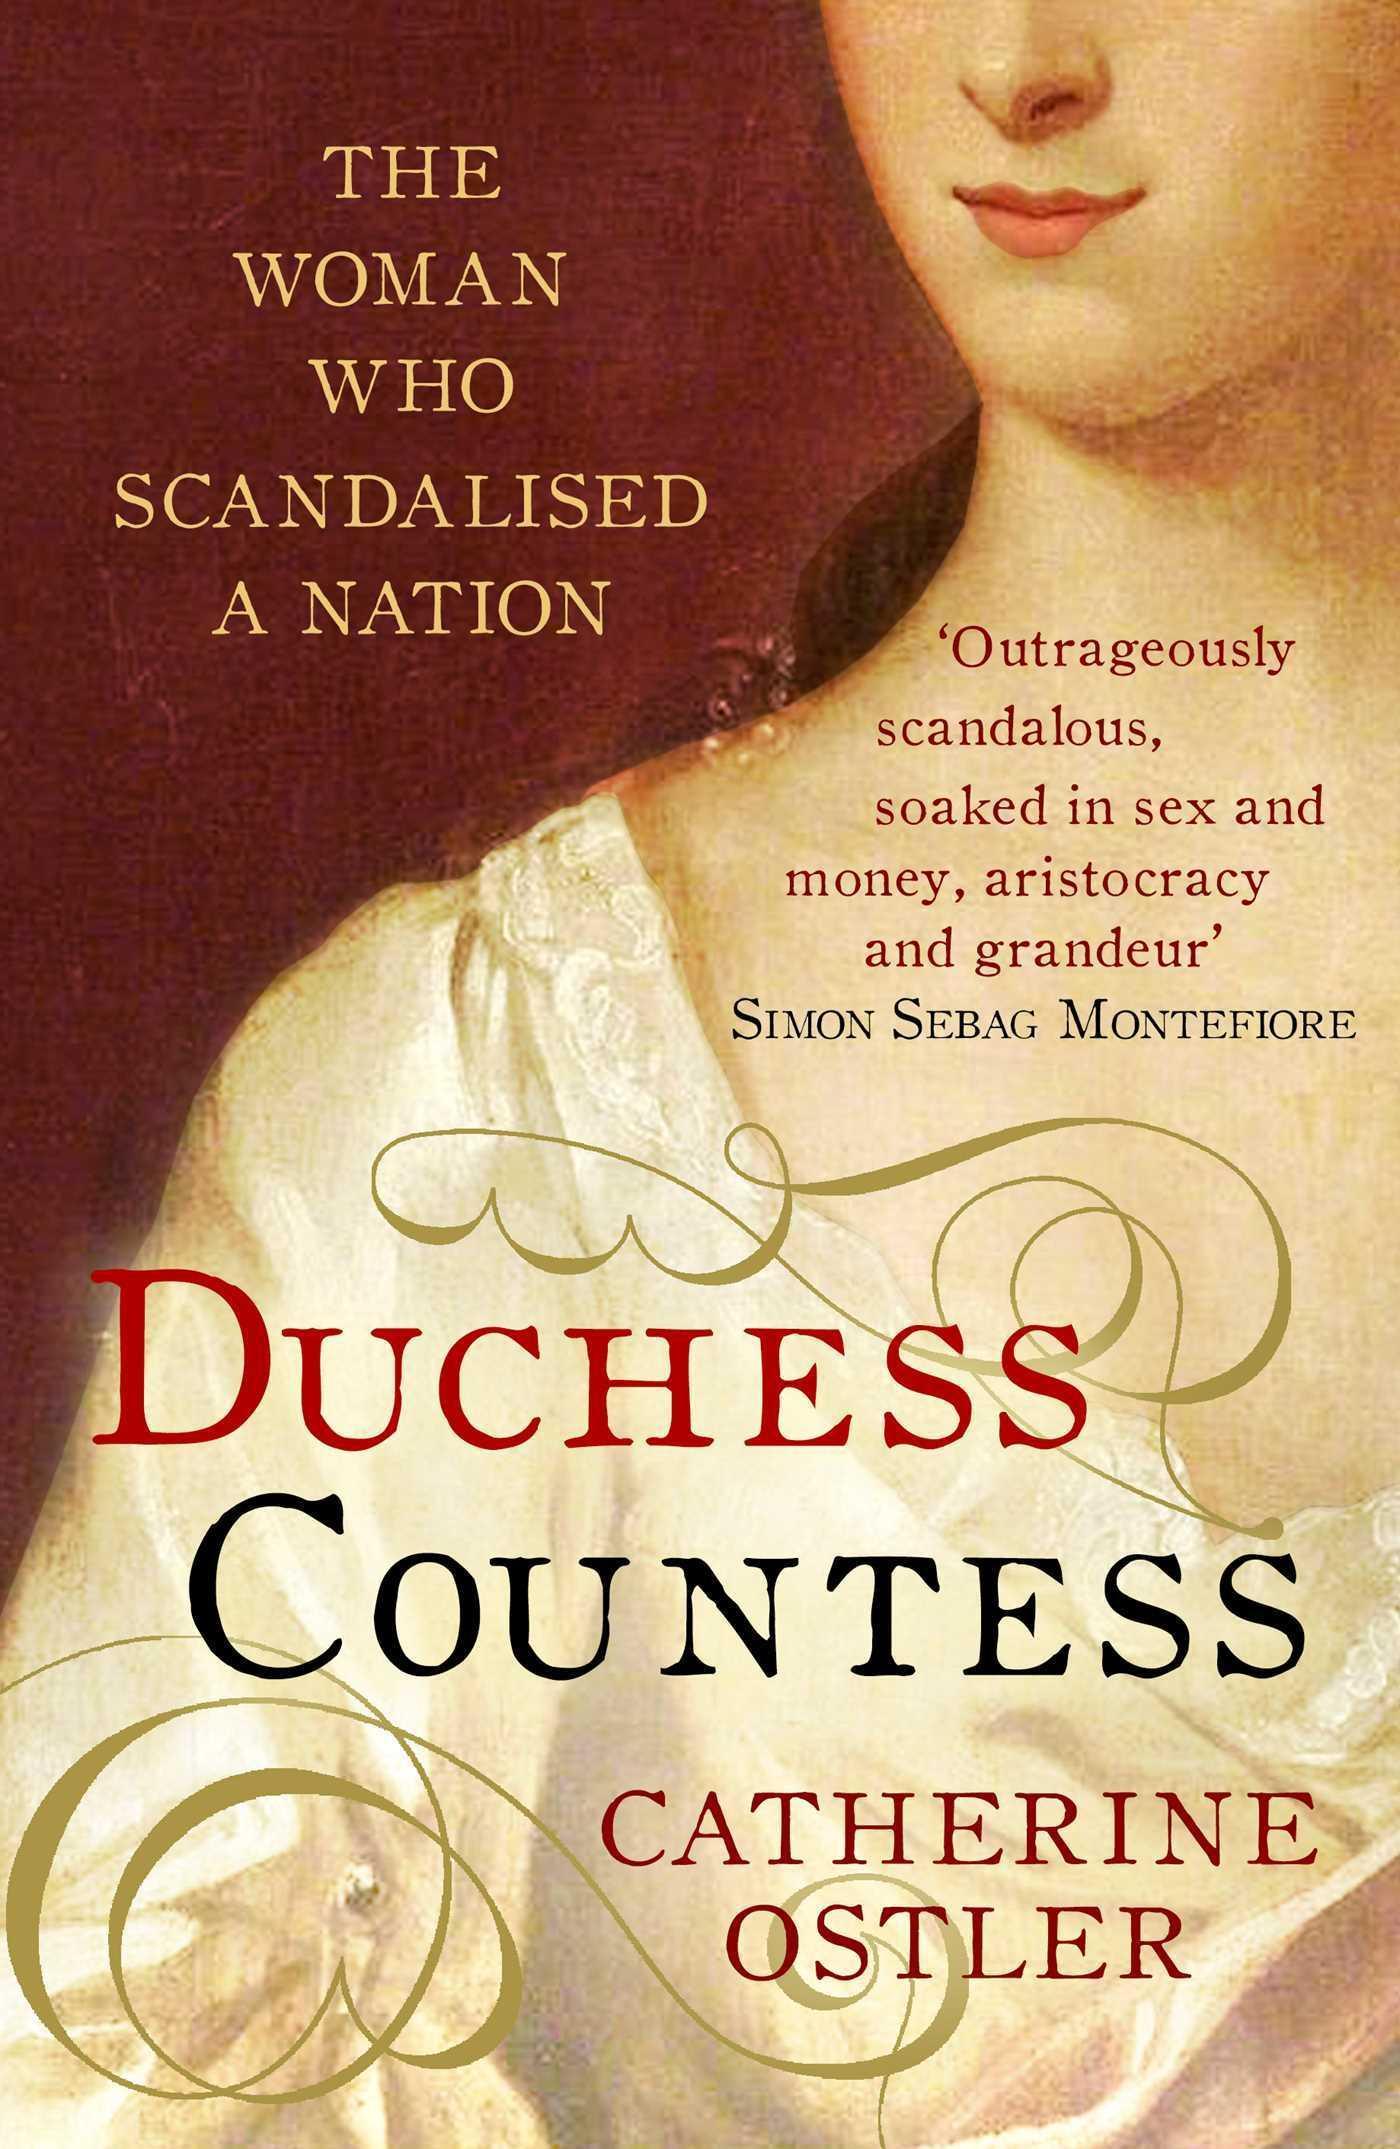 Duchess Countess